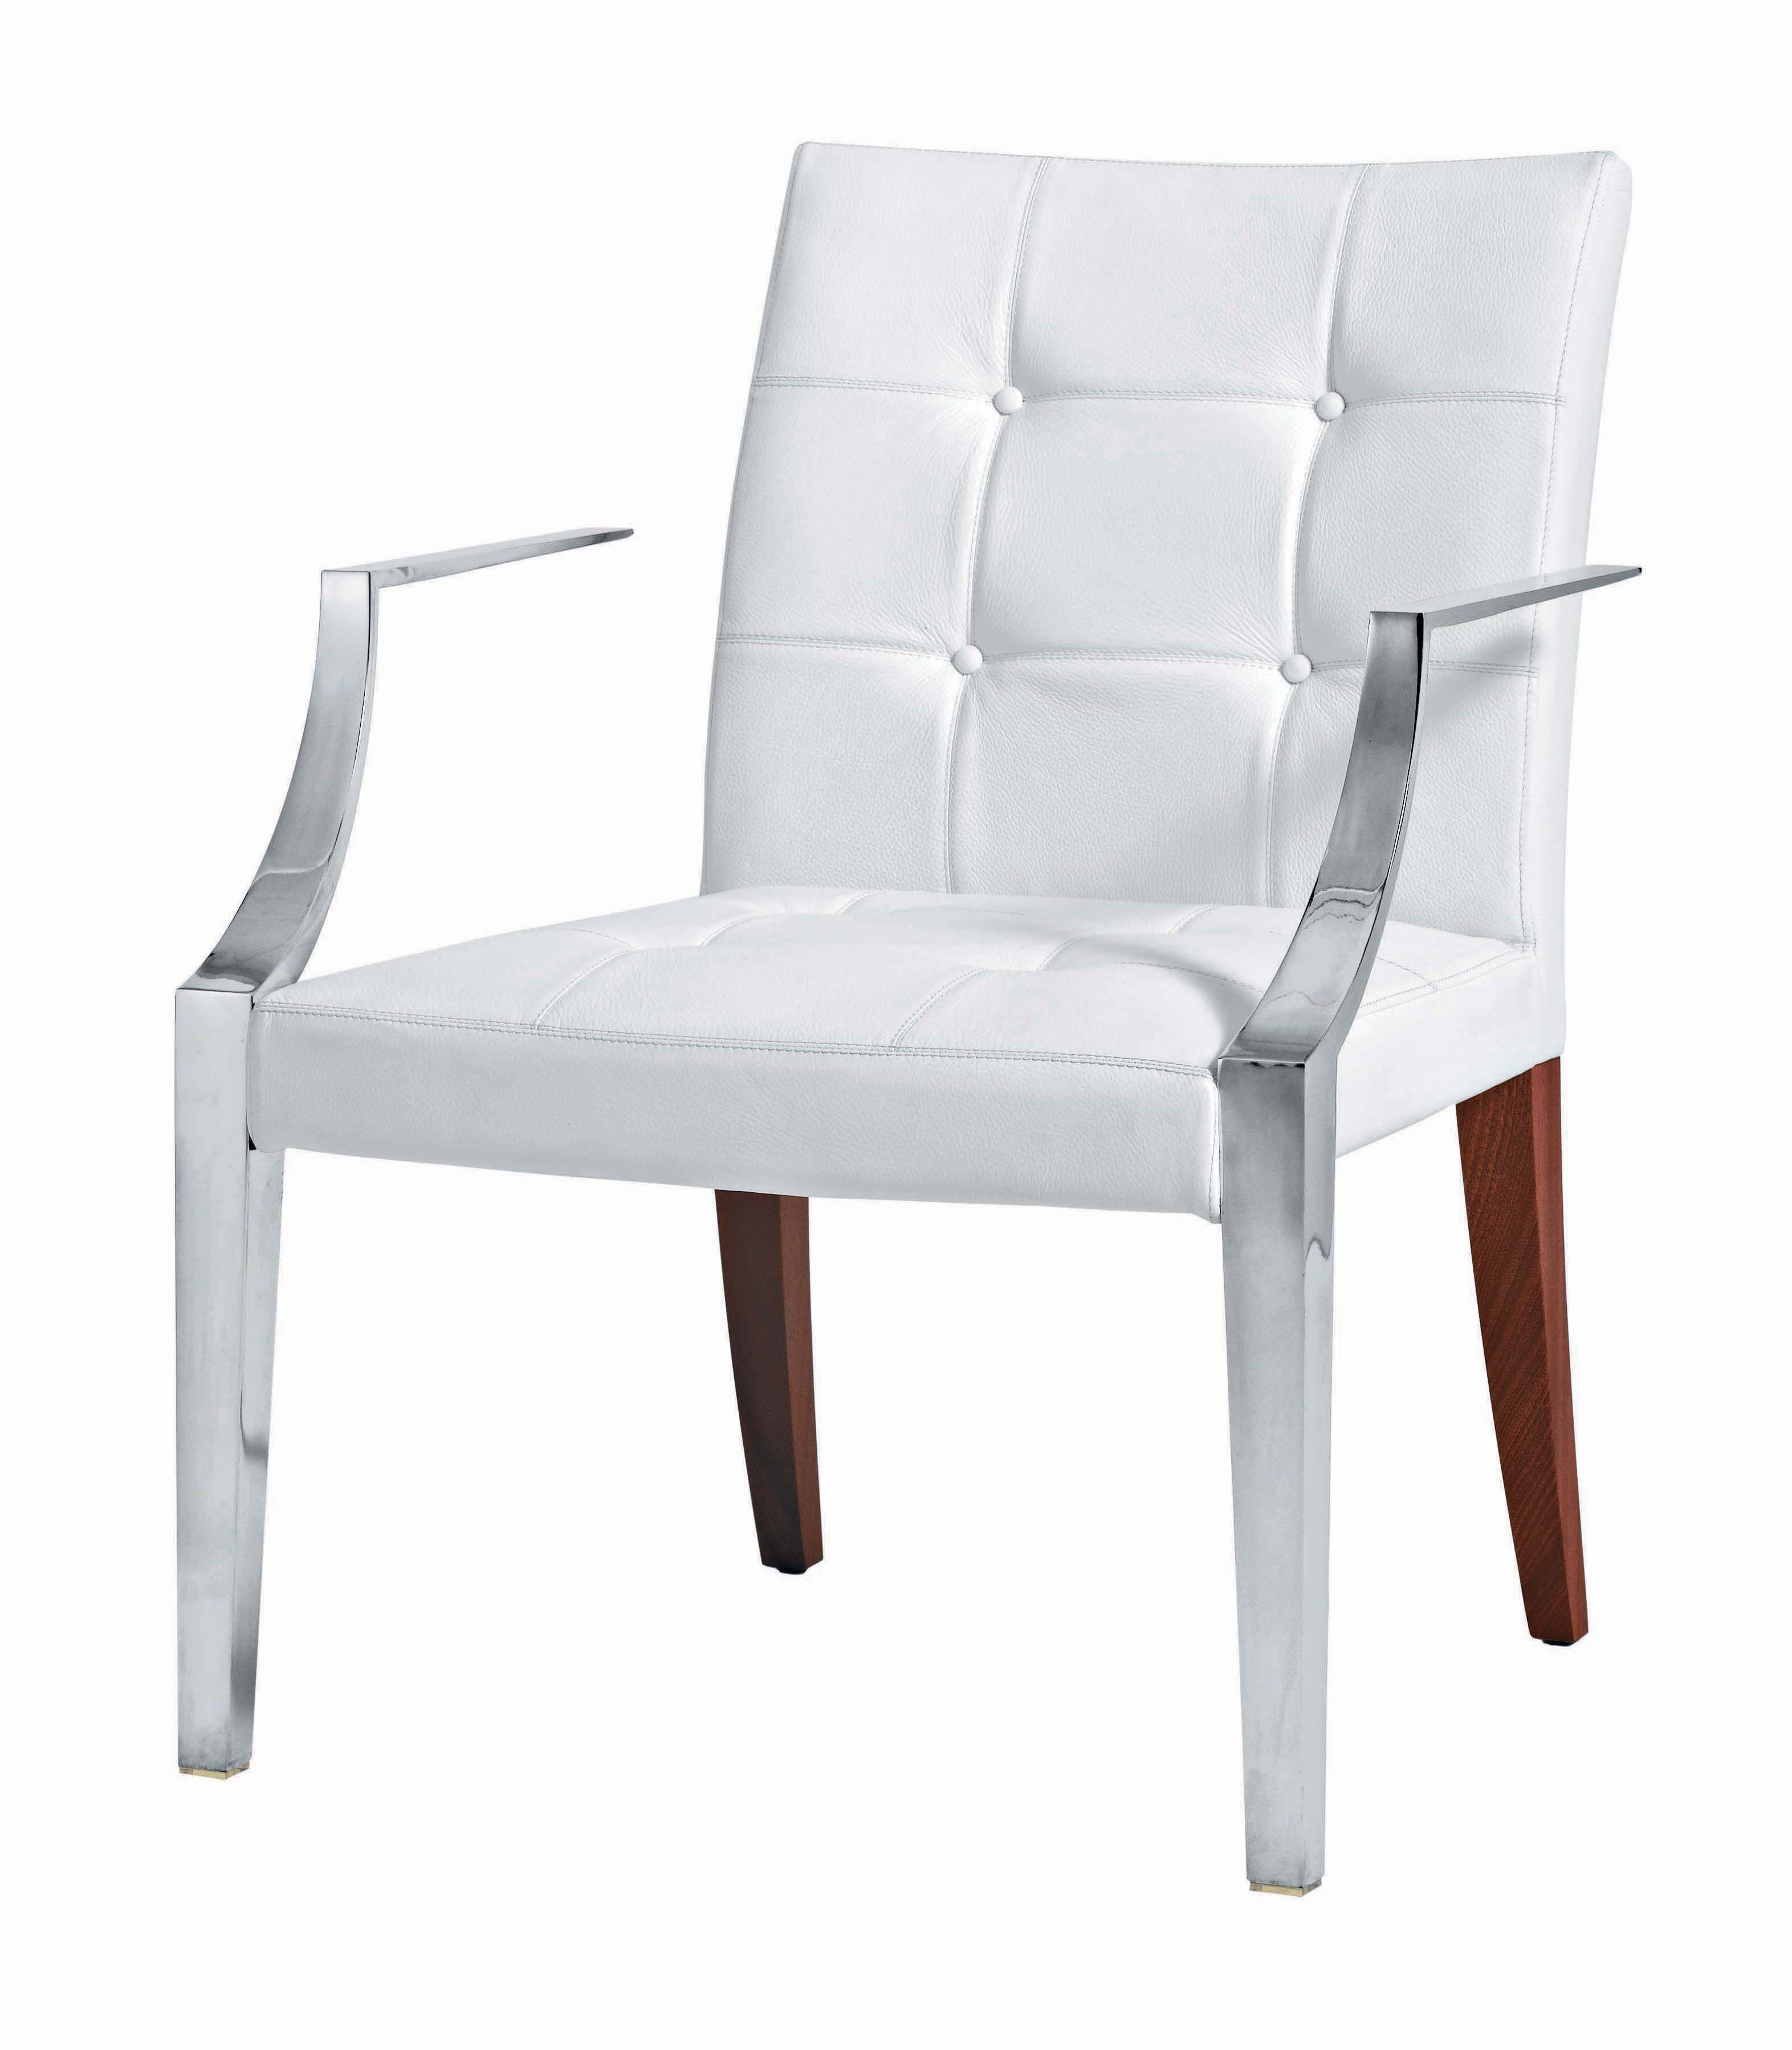 Möbel - Stühle  - Monseigneur Gepolsterter Sessel - Driade - weißes Leder - Leder, Mahagoni, rostfreier Stahl